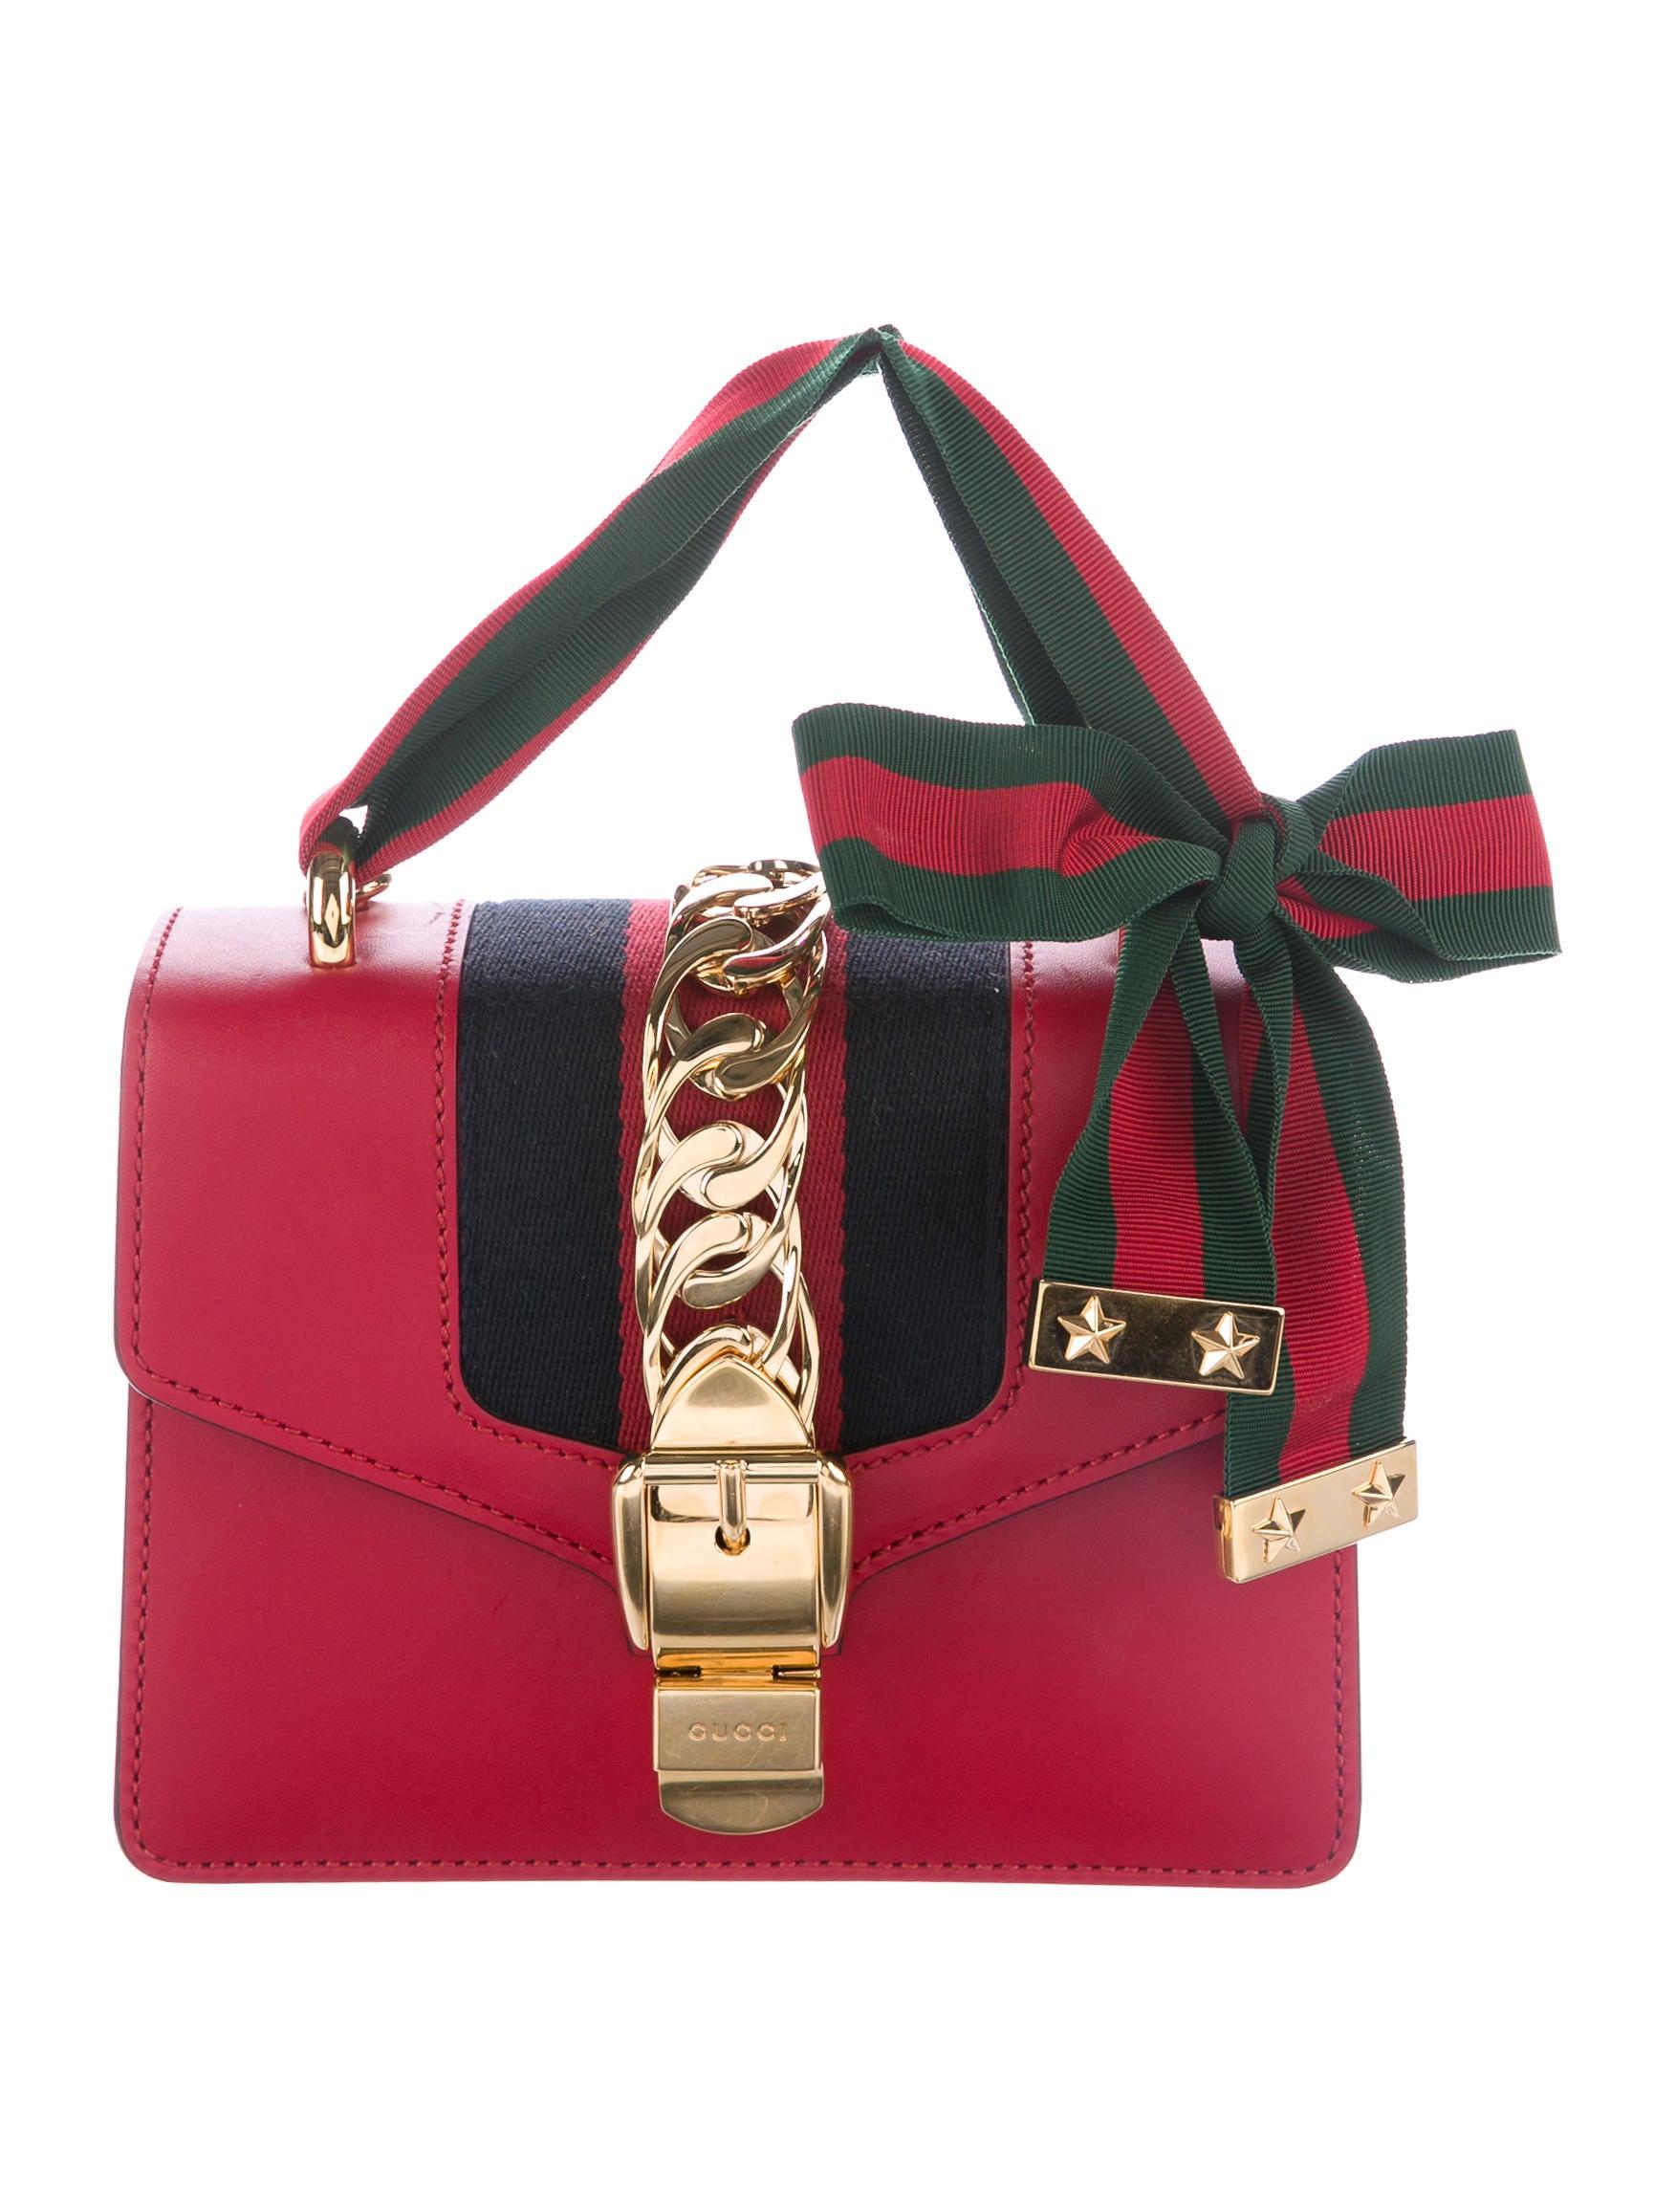 55dab2e8fc74 Gucci 2017 Mini Sylvie Chain Bag - Handbags - GUC161573 | The RealReal